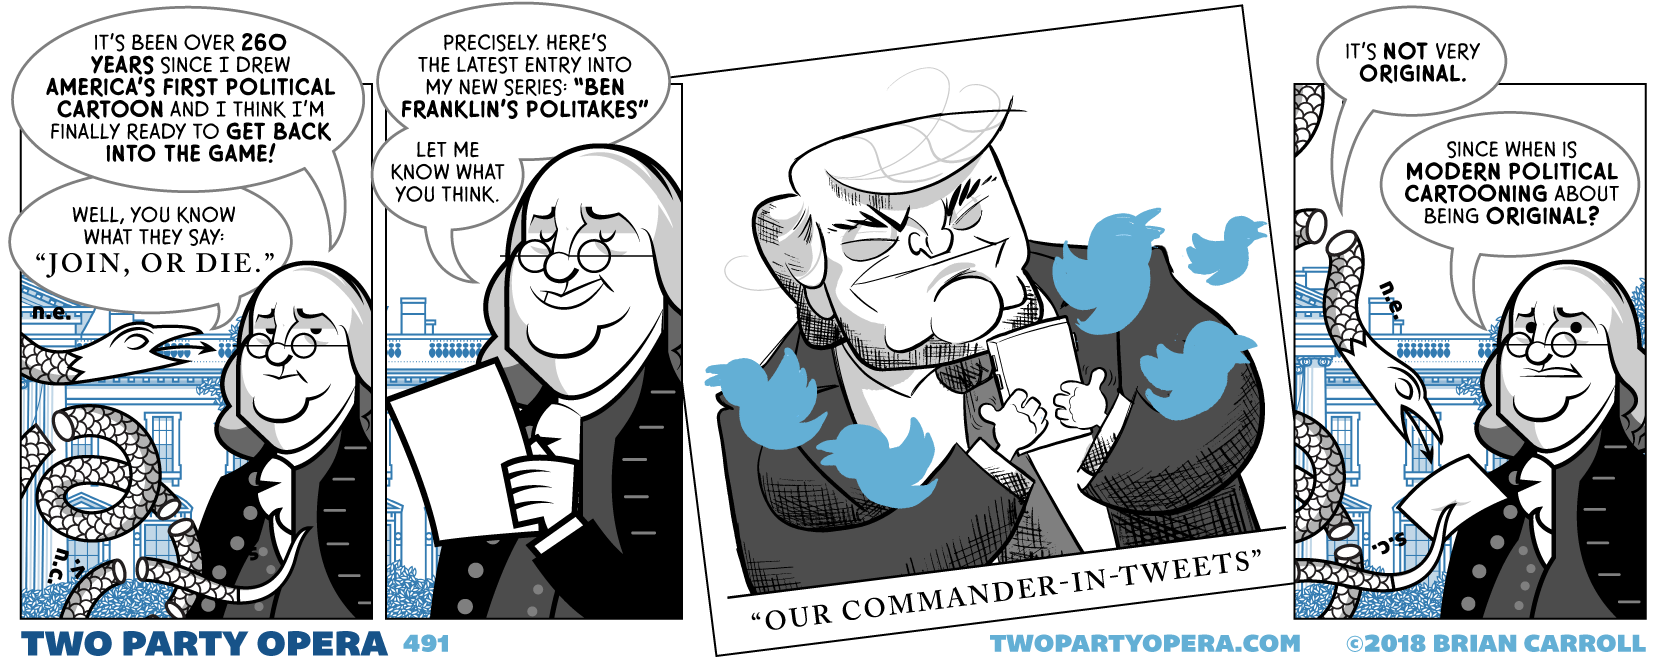 Ben Franklin's Politakes